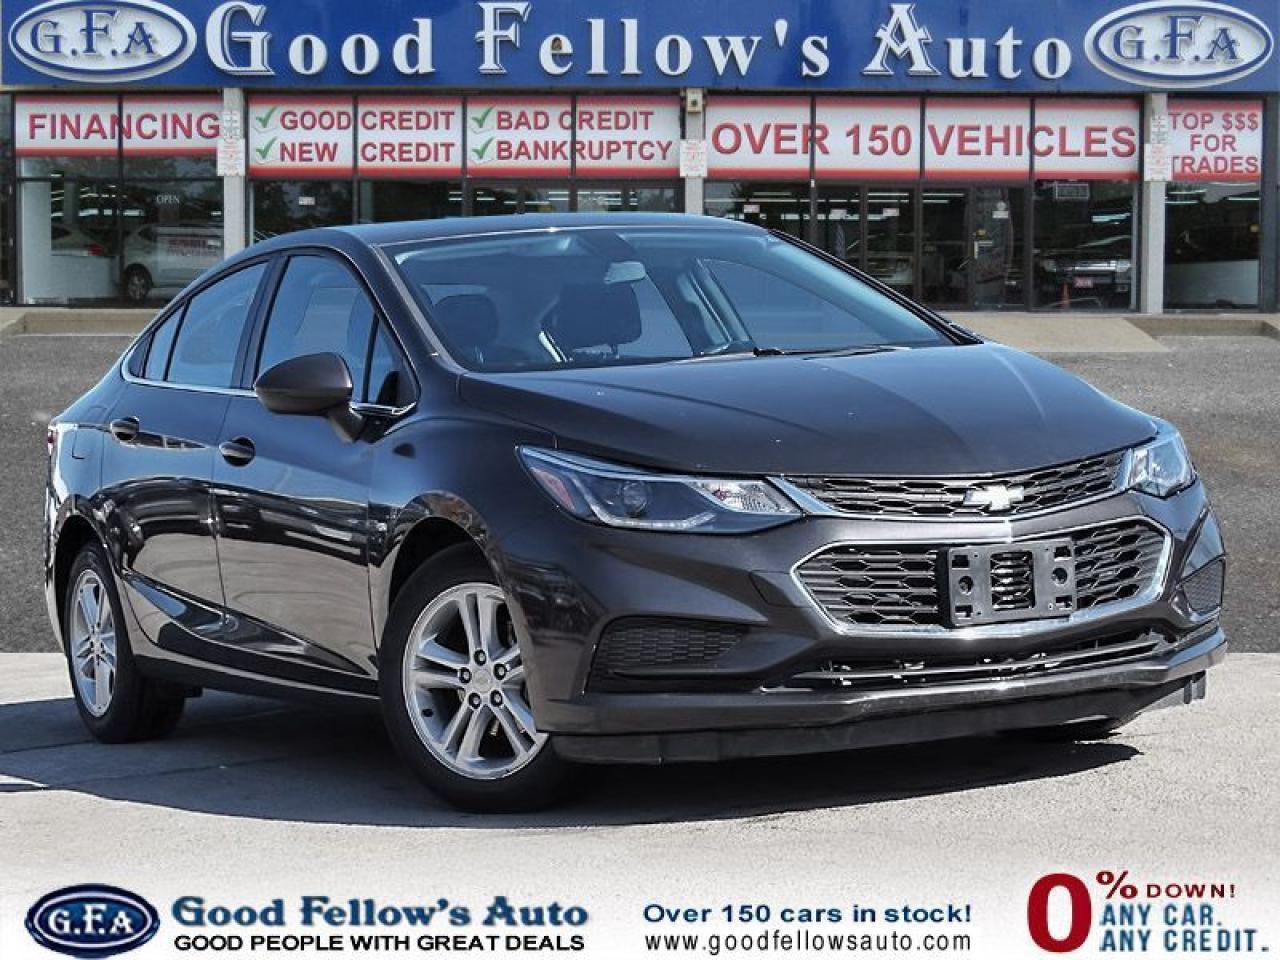 2017 Chevrolet Cruze Special Price Offer ...!